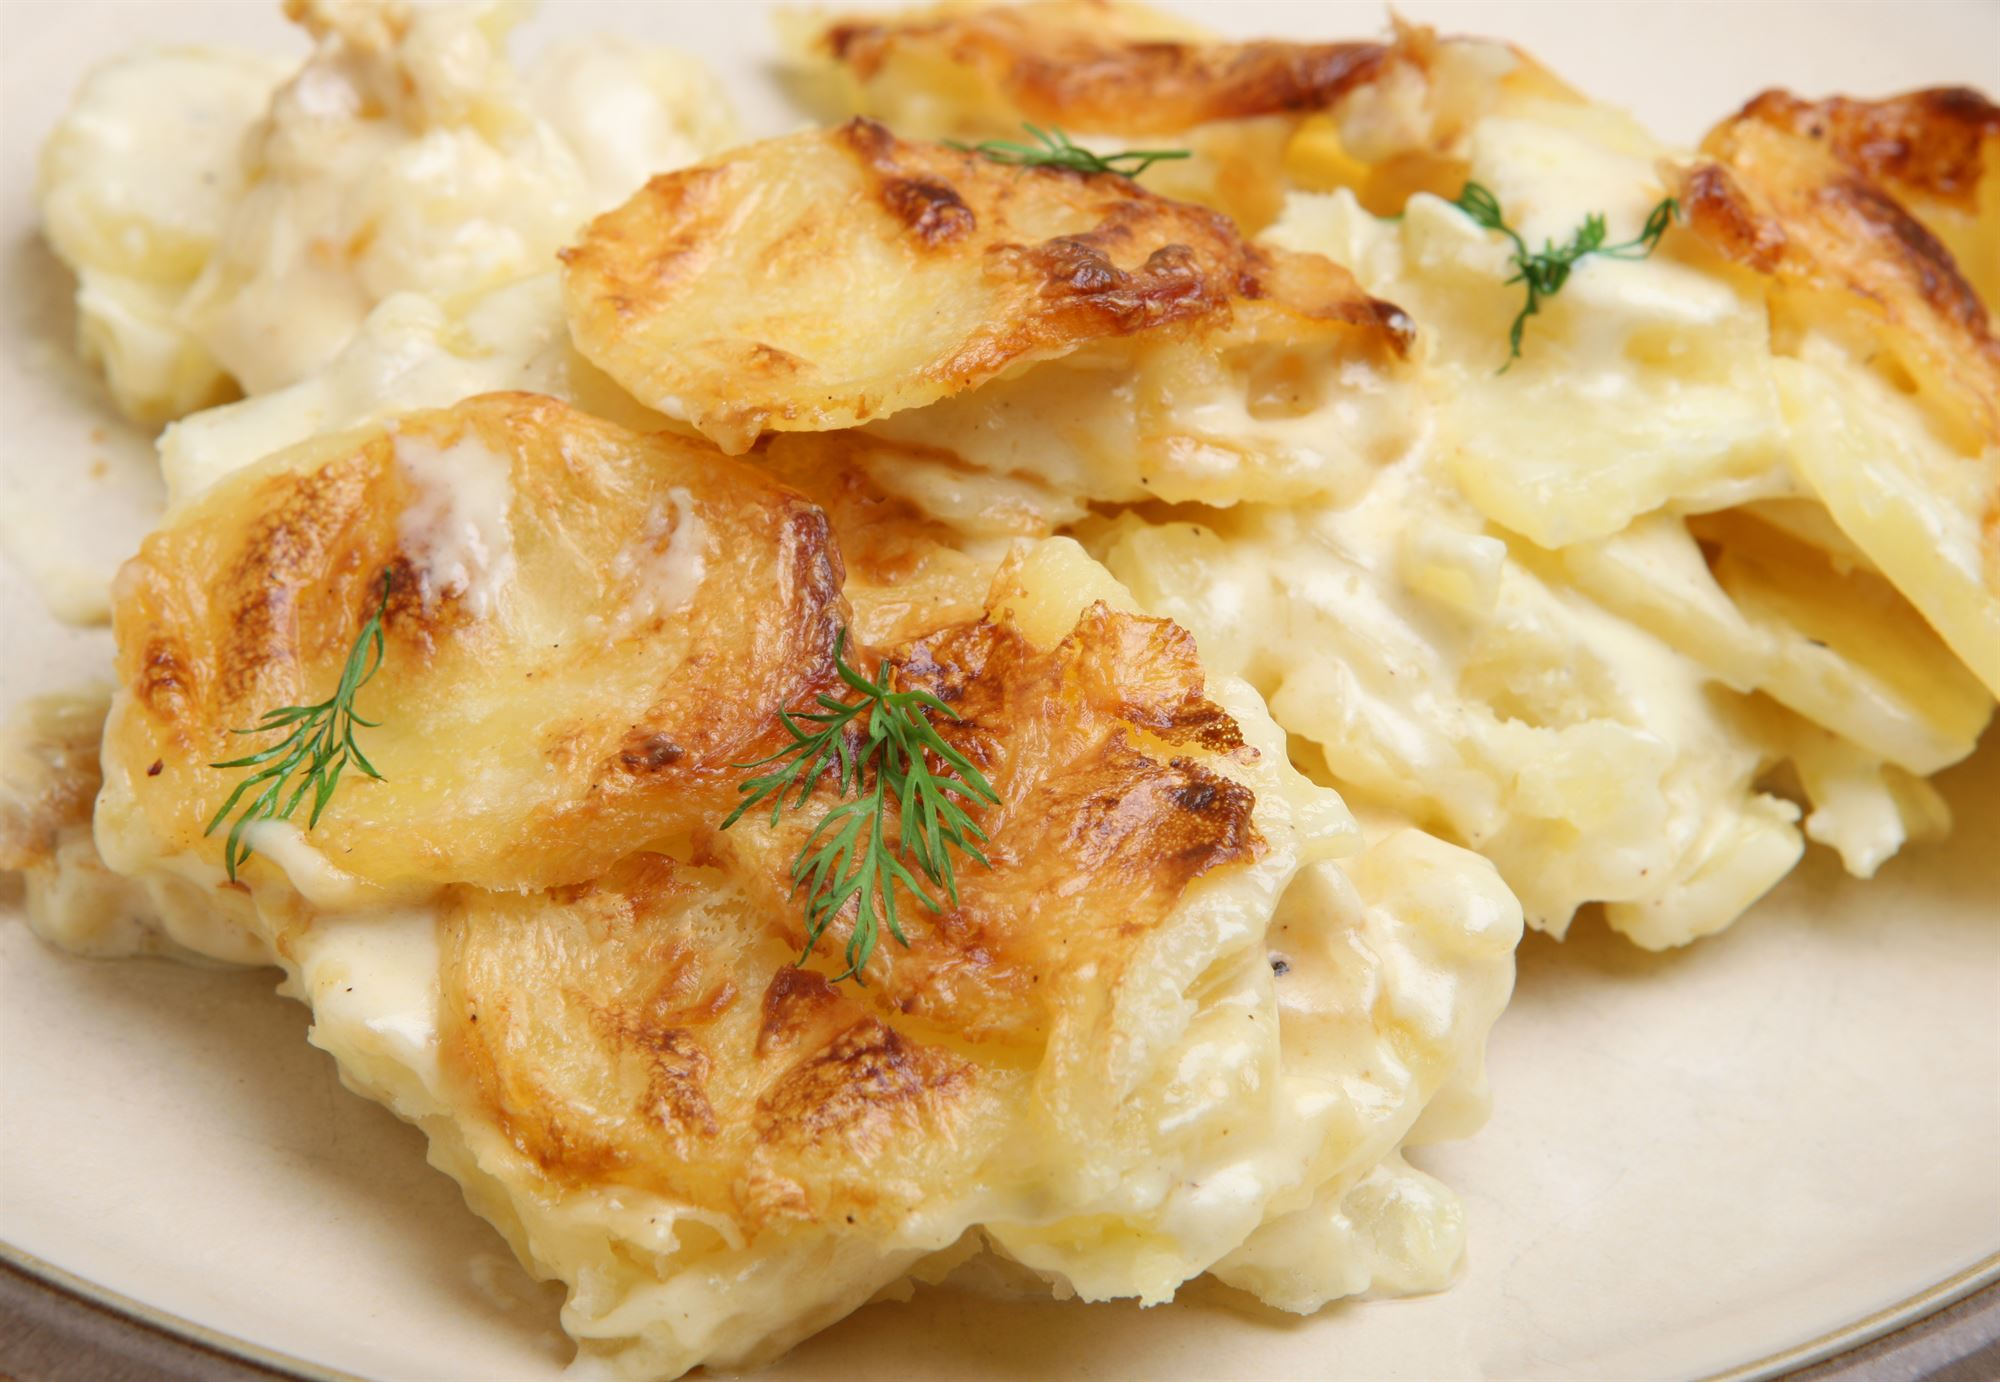 Flødekartofler med løg